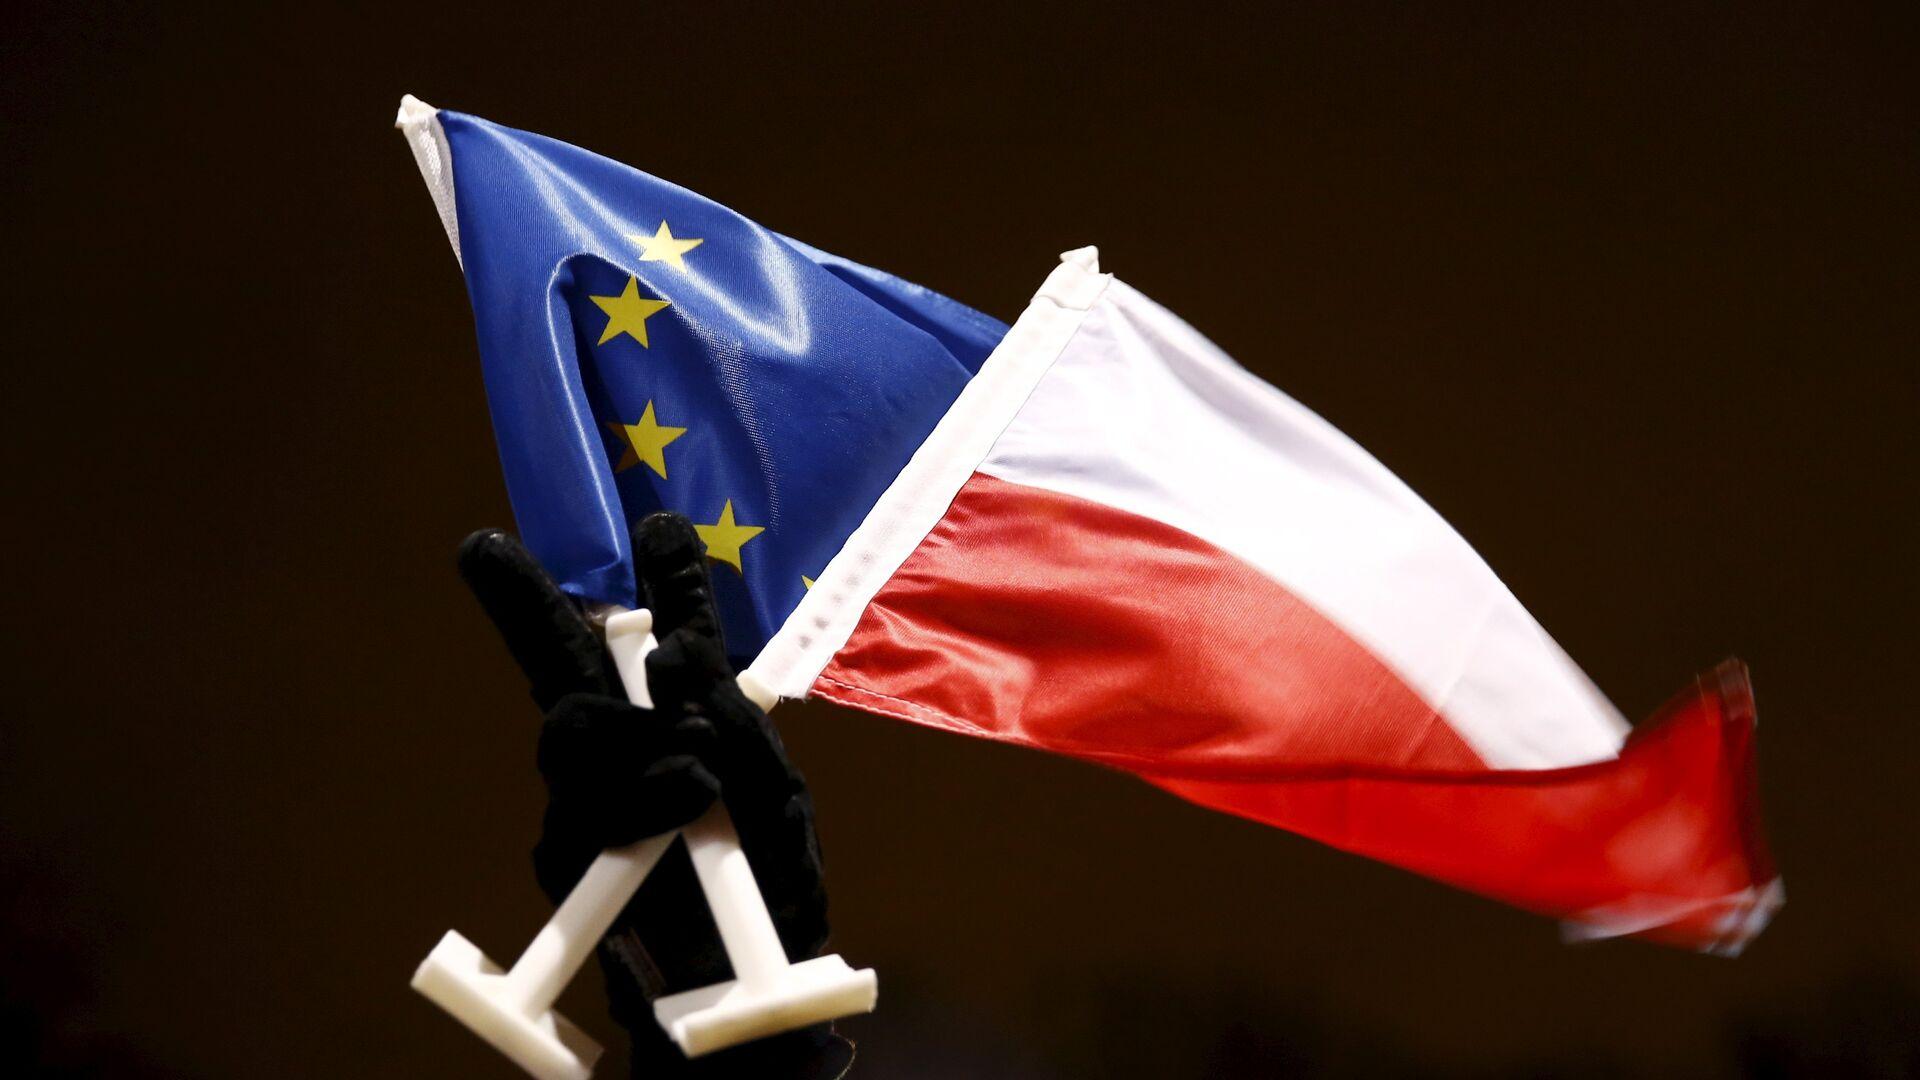 Flaga Polski i Unii Europejskiej - Sputnik Polska, 1920, 08.10.2021